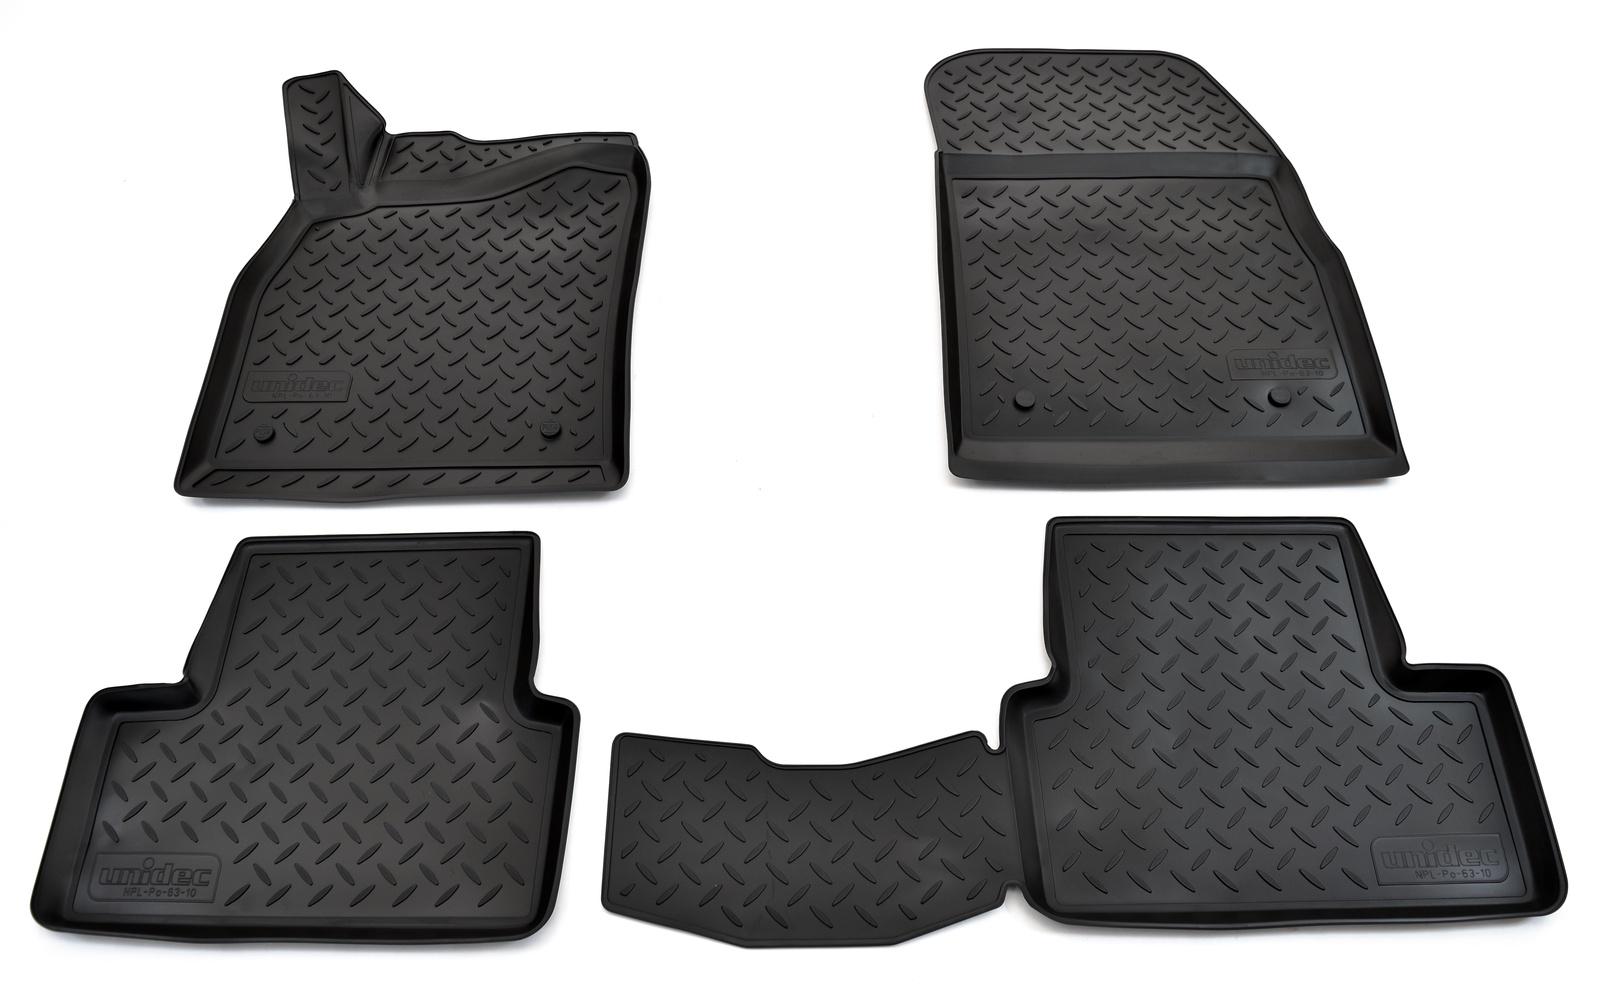 купить Коврики в салон автомобиля Norplast для Opel Astra J 3D (2010), NPL-Po-63-10, черный онлайн